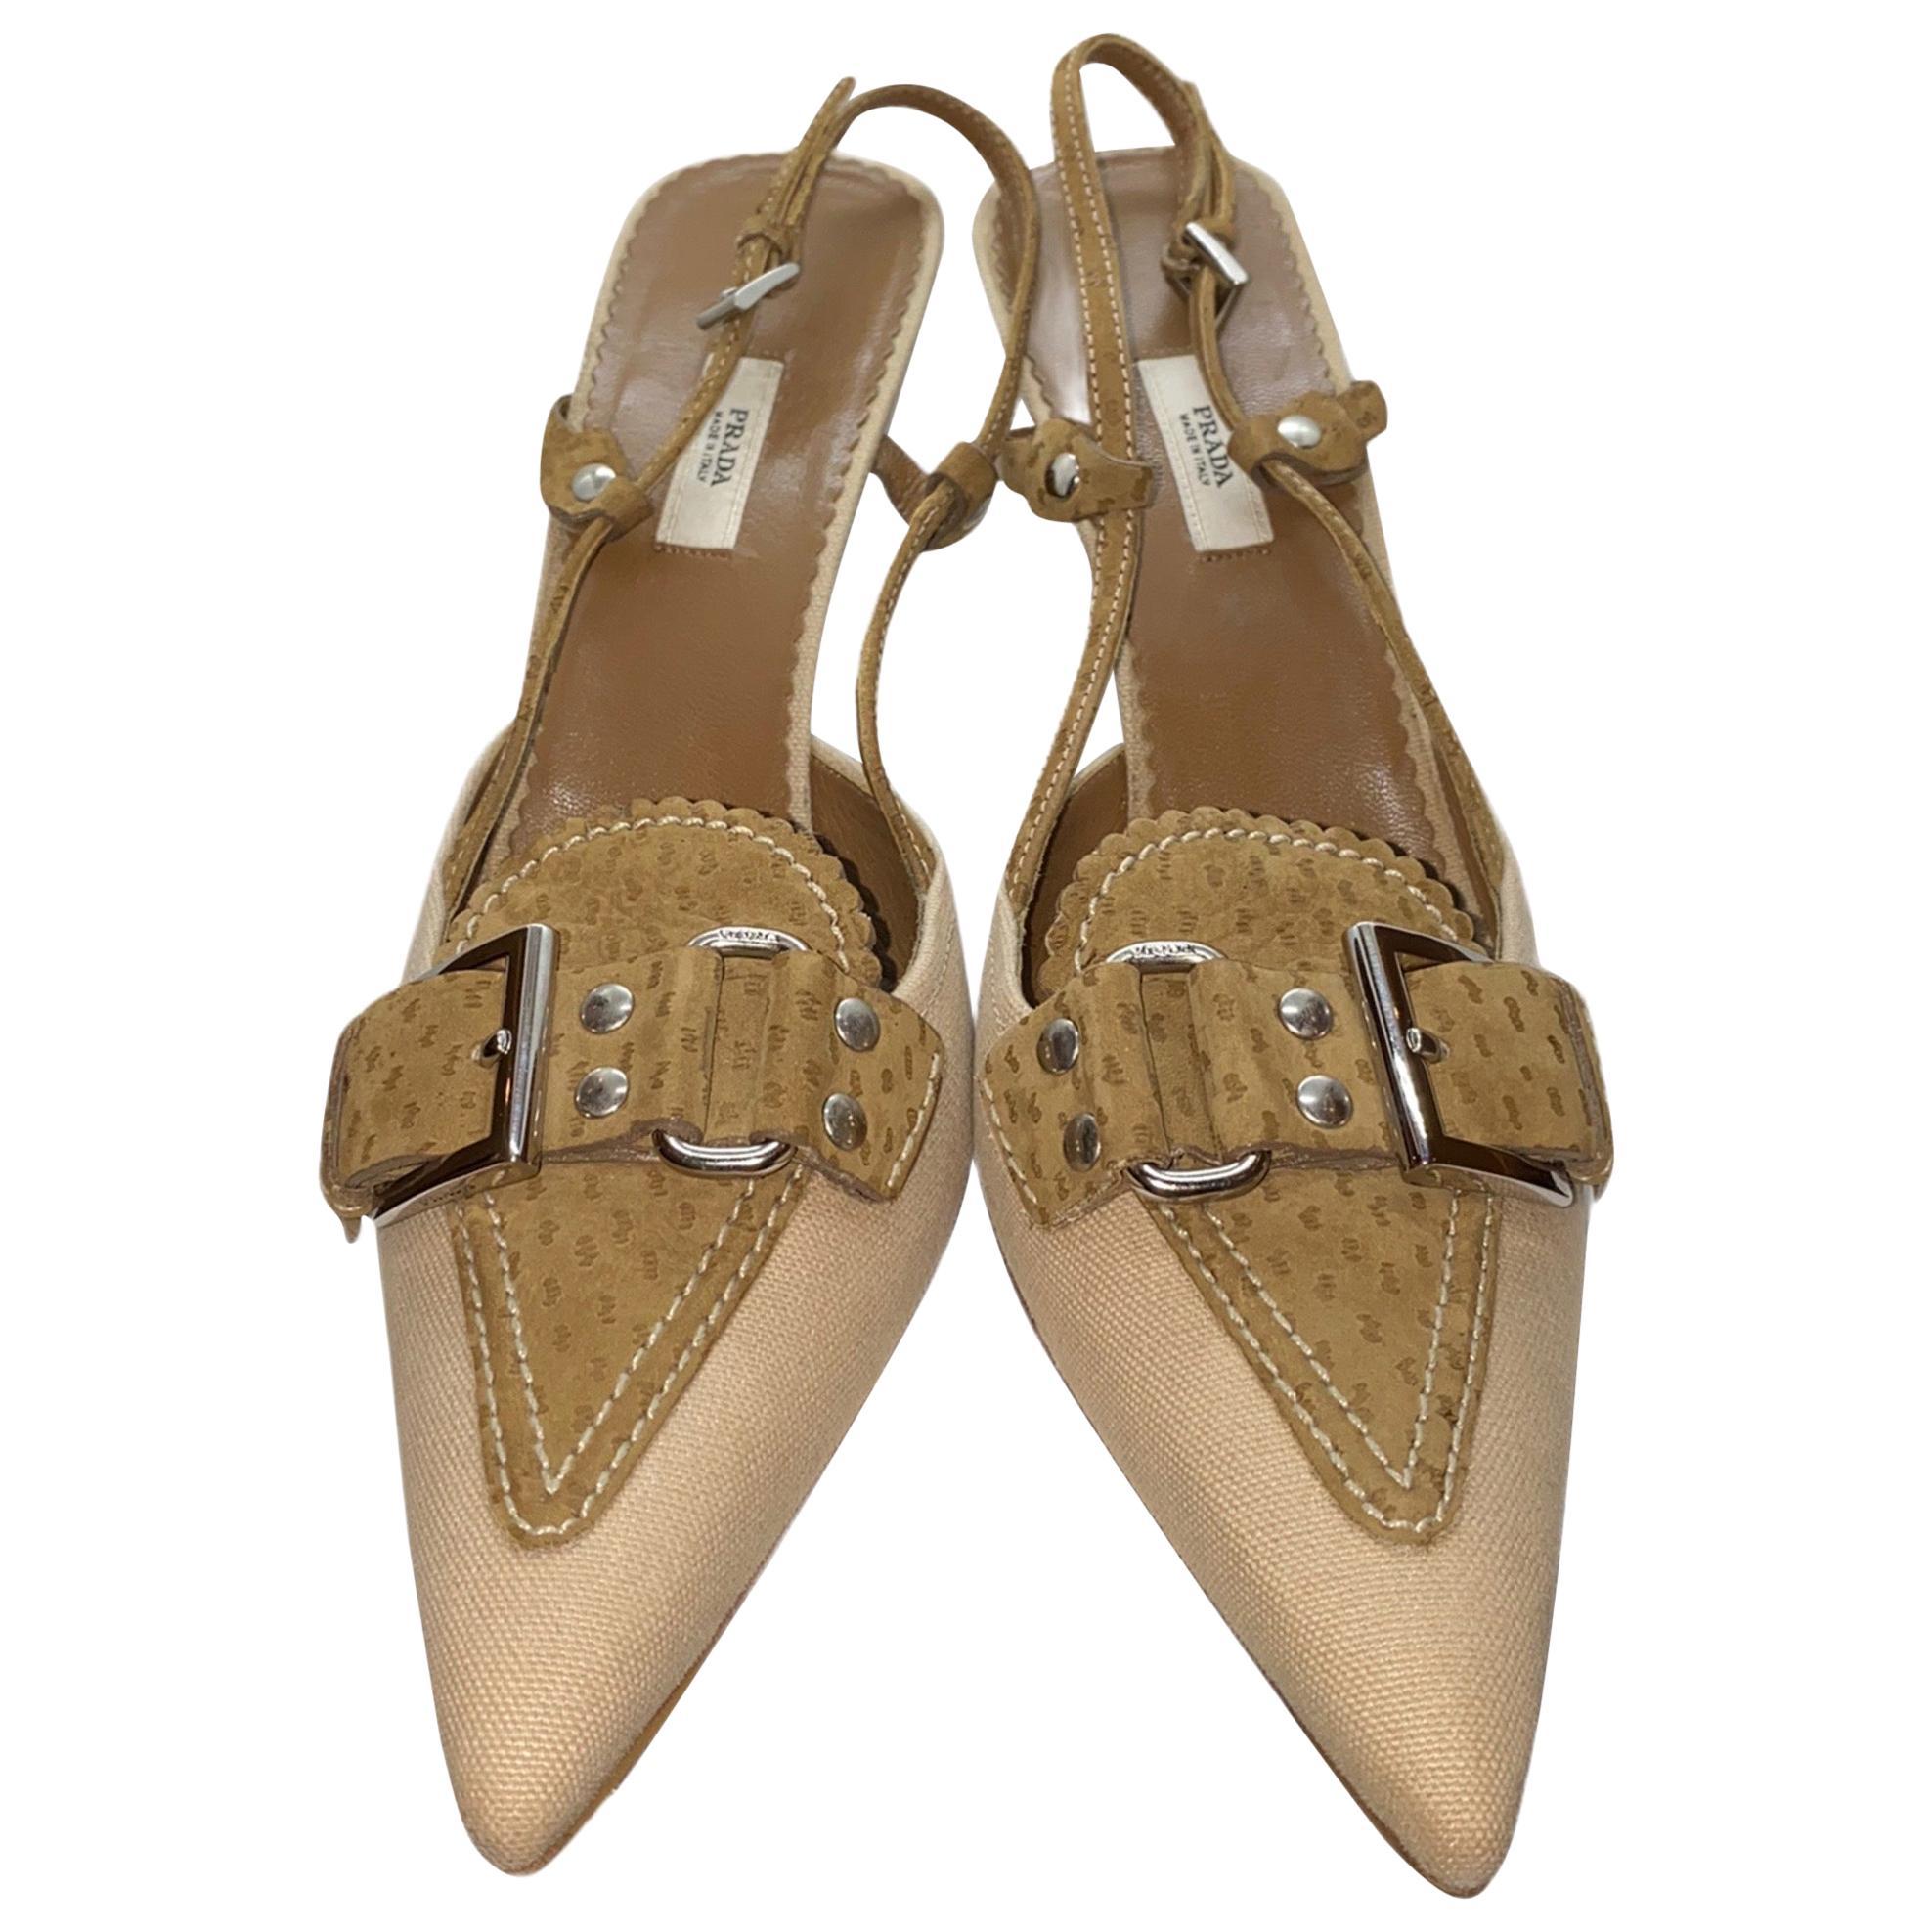 NEW Prada Canvas & Suede Slingback Mules Heel Pumps